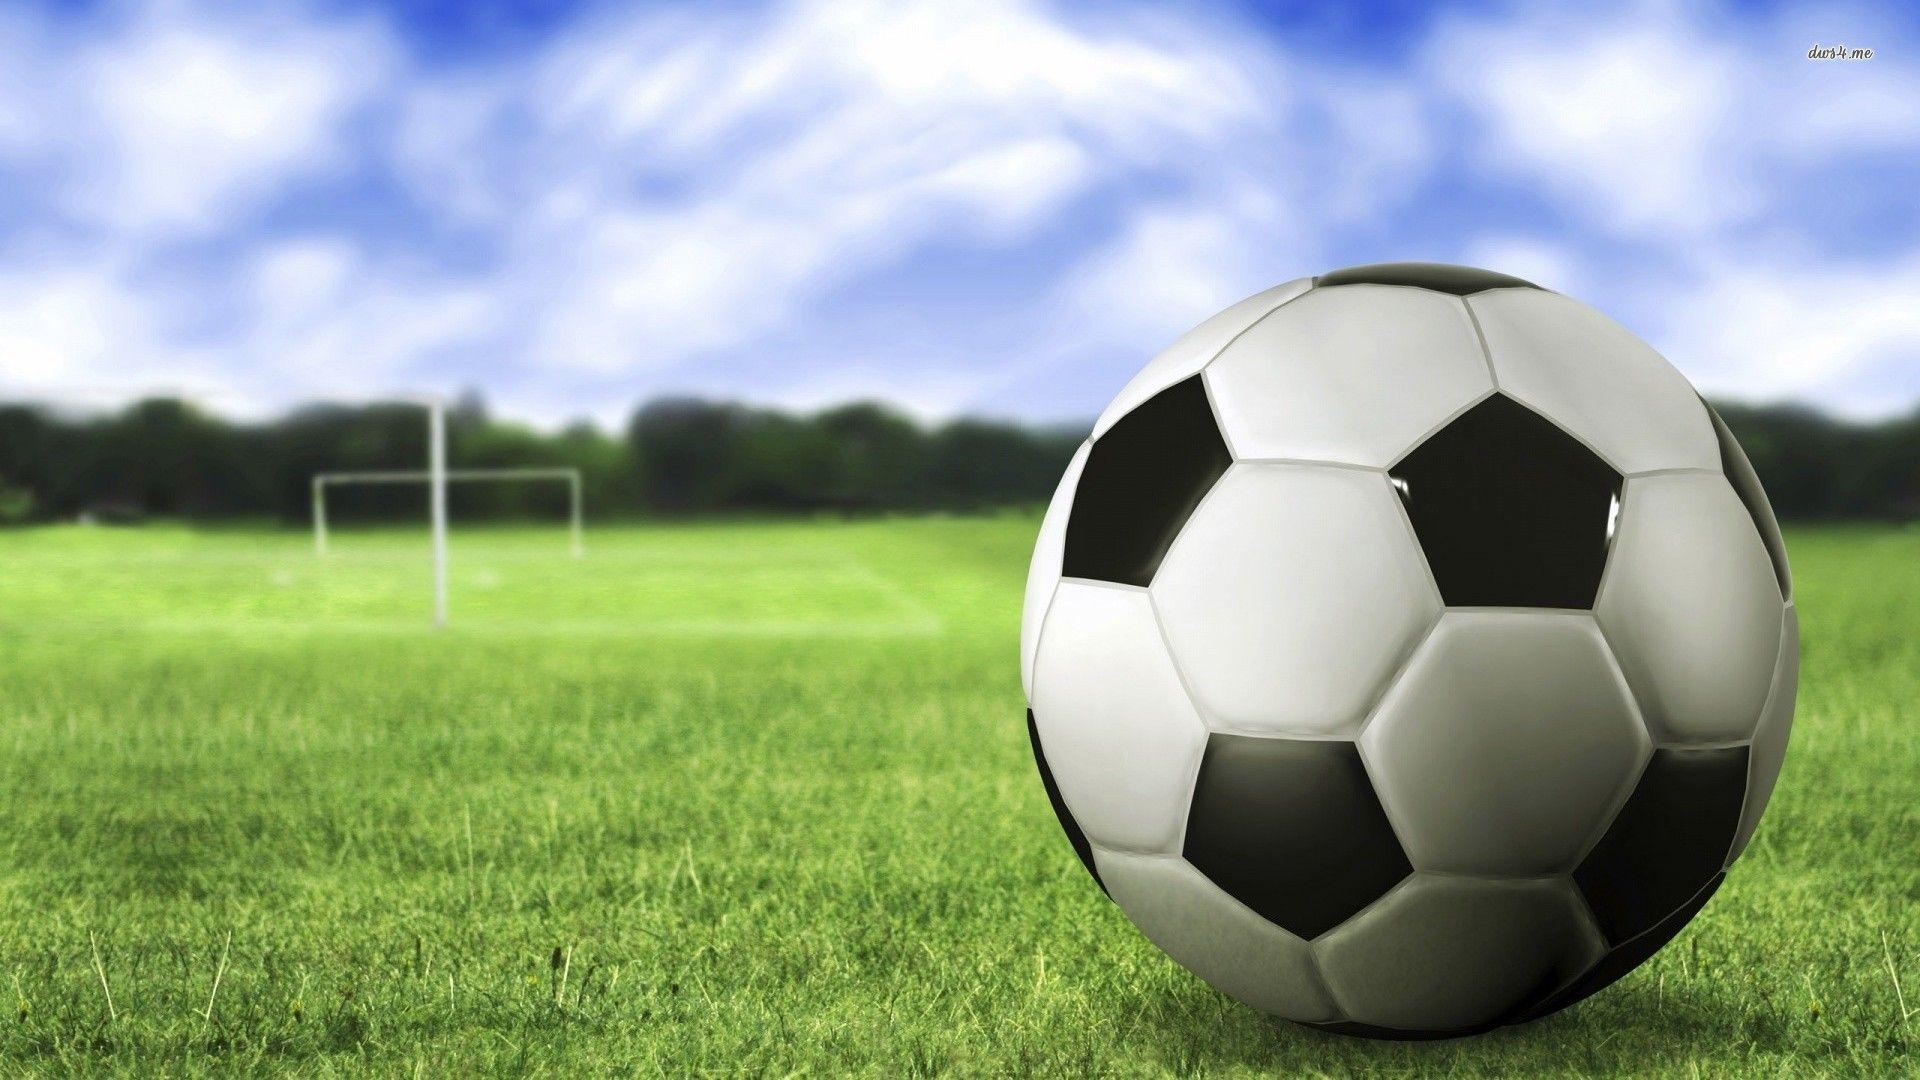 Soccer Ball On Field Hd Wallpapers